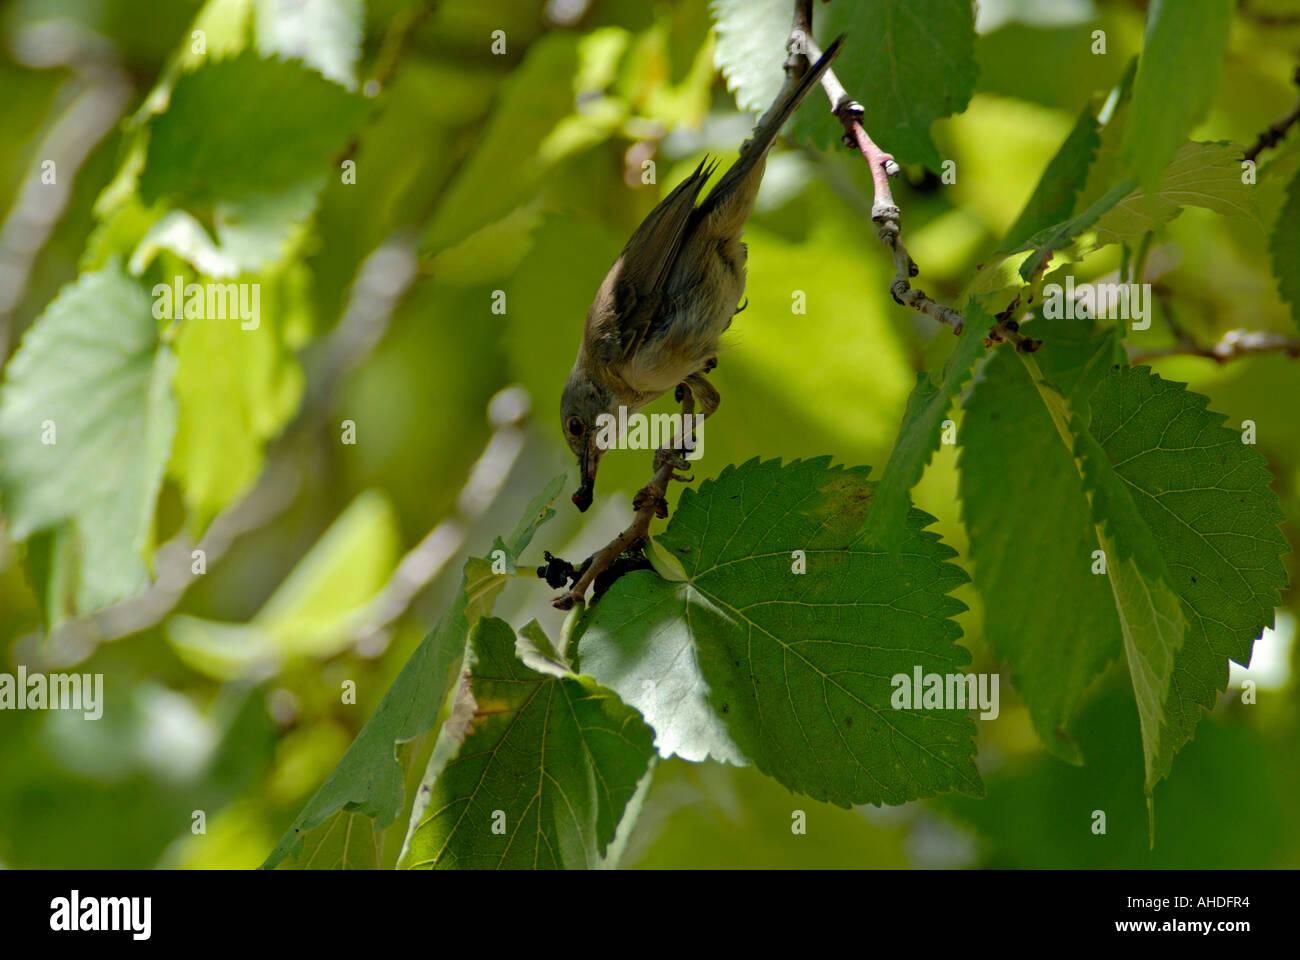 Passerine feeding on fruiting tree - Stock Image